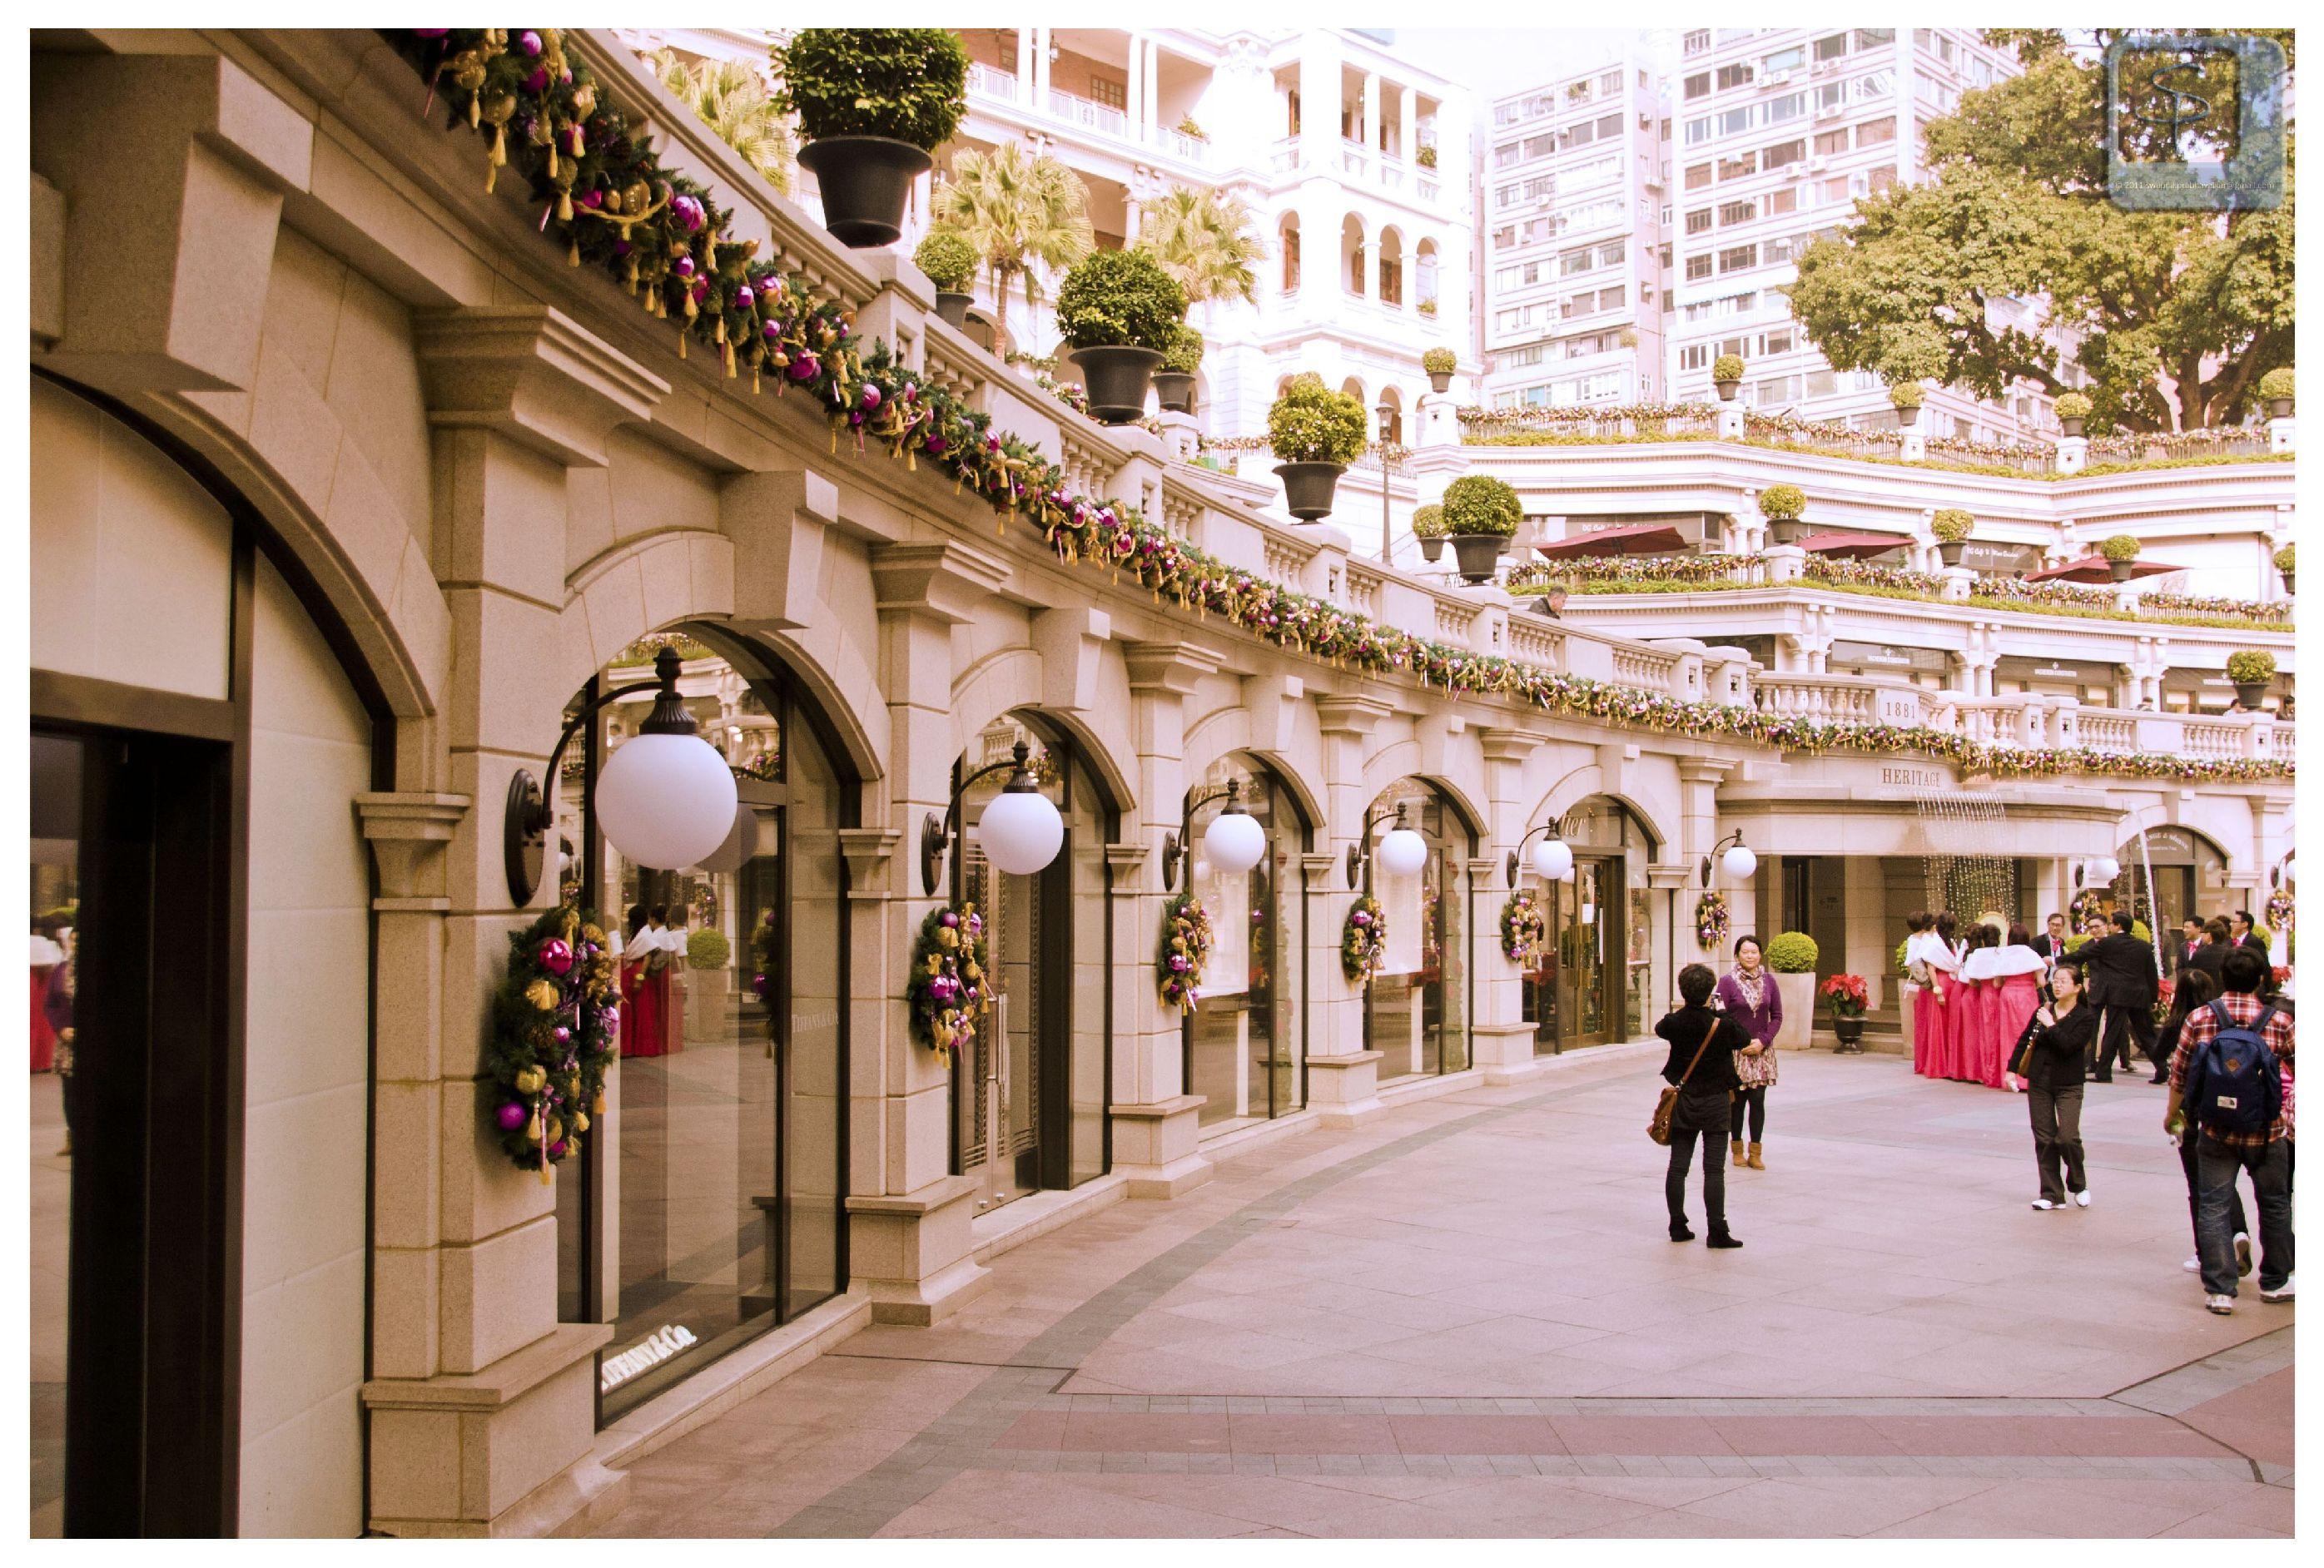 File:1881 Heritage, Hong Kong.JPG